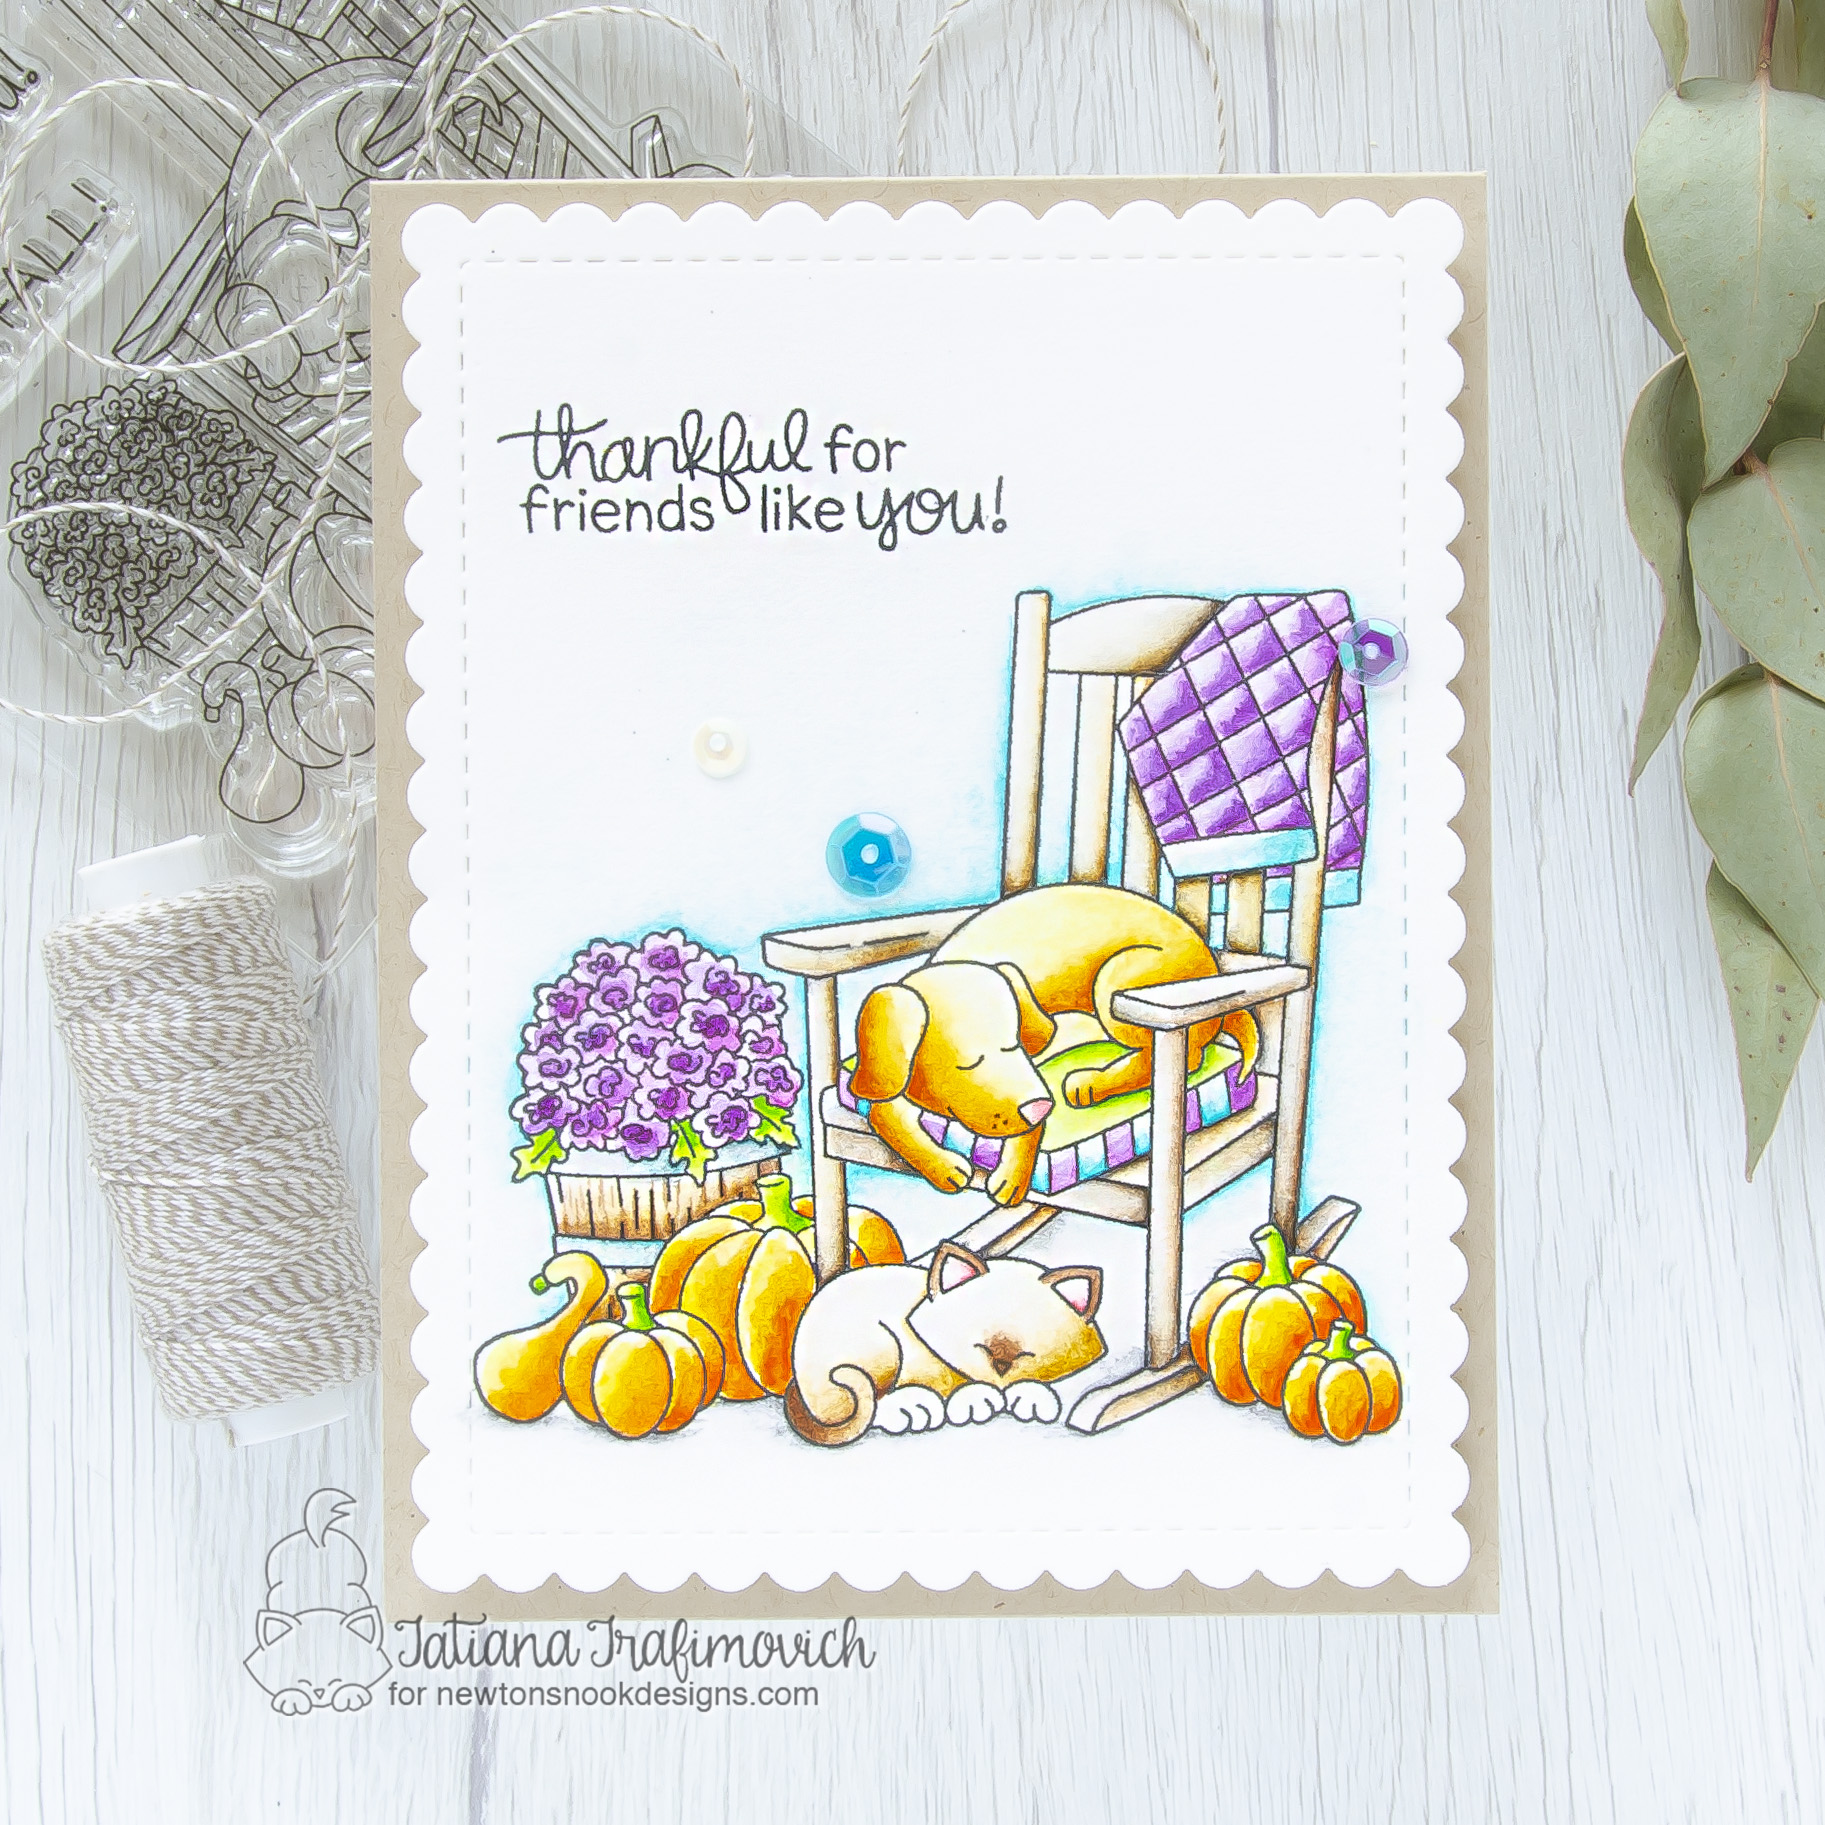 Friend #handmade card by Tatiana Trafimovich #tatianacraftandart - Fall Friends stamp set by Newton's Nook Designs #newtonsnook